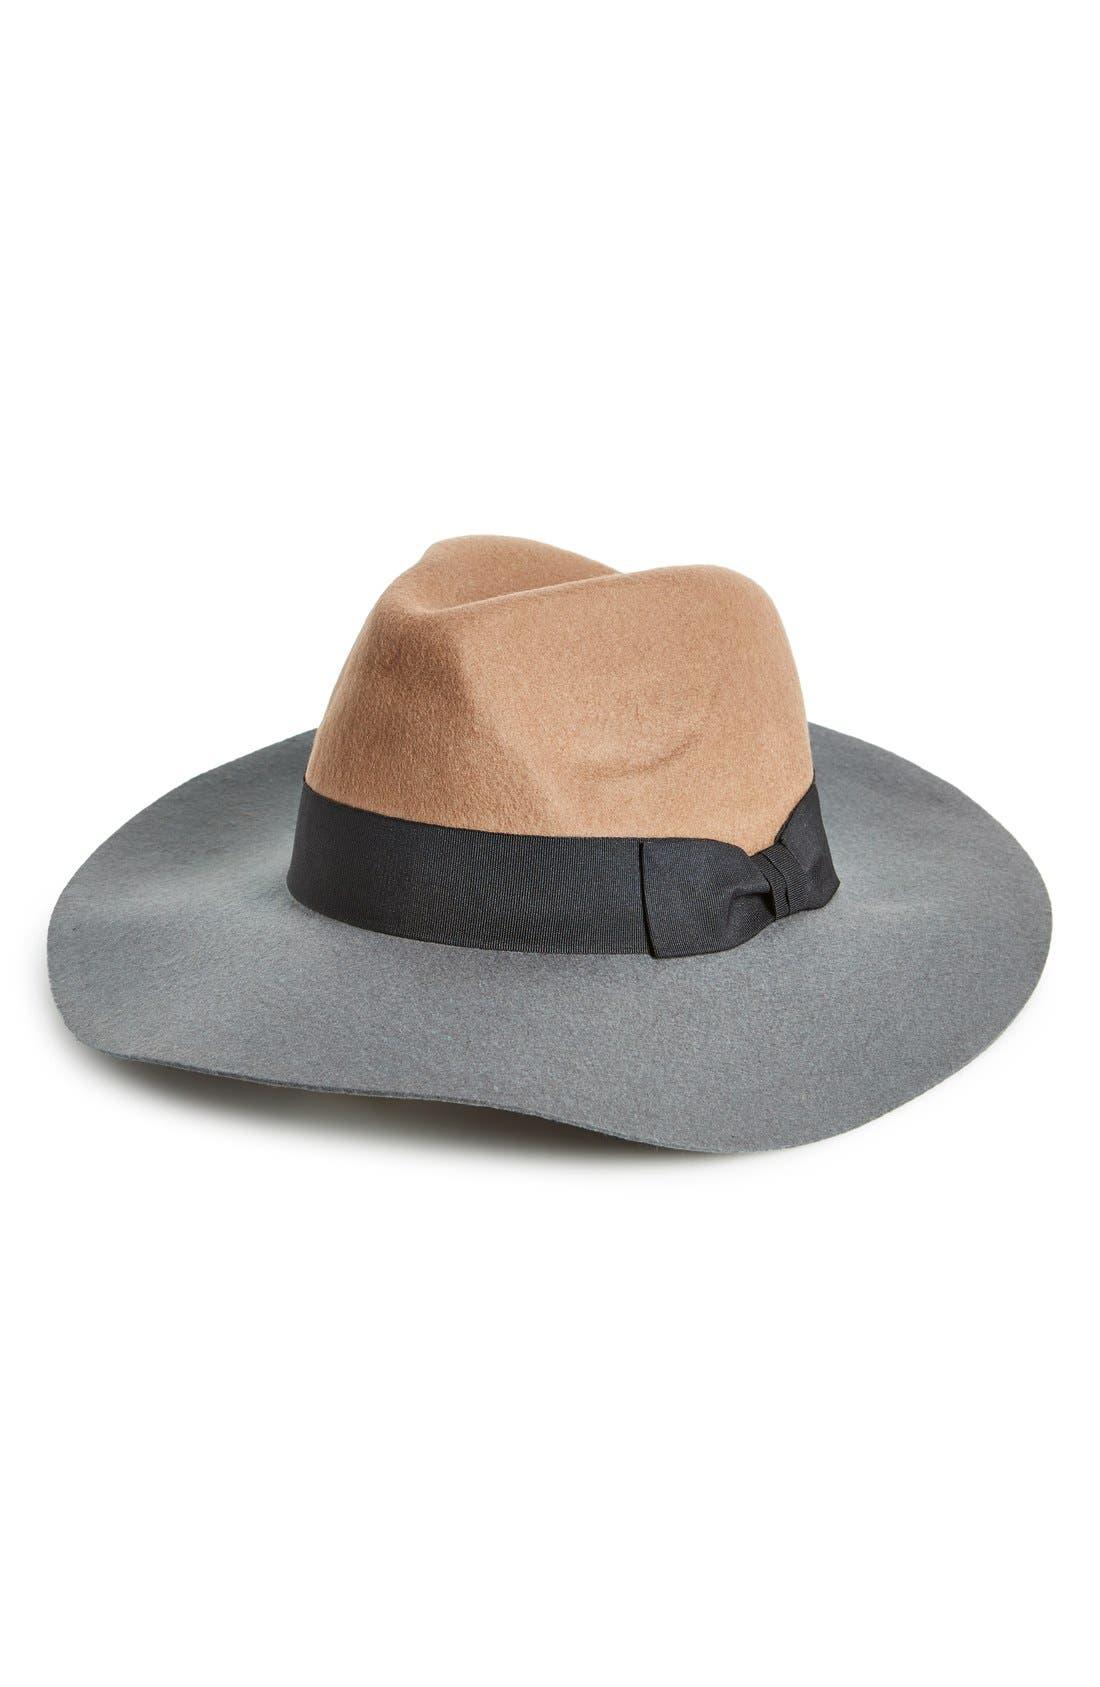 Main Image - BCBGeneration Colorblock Panama Hat